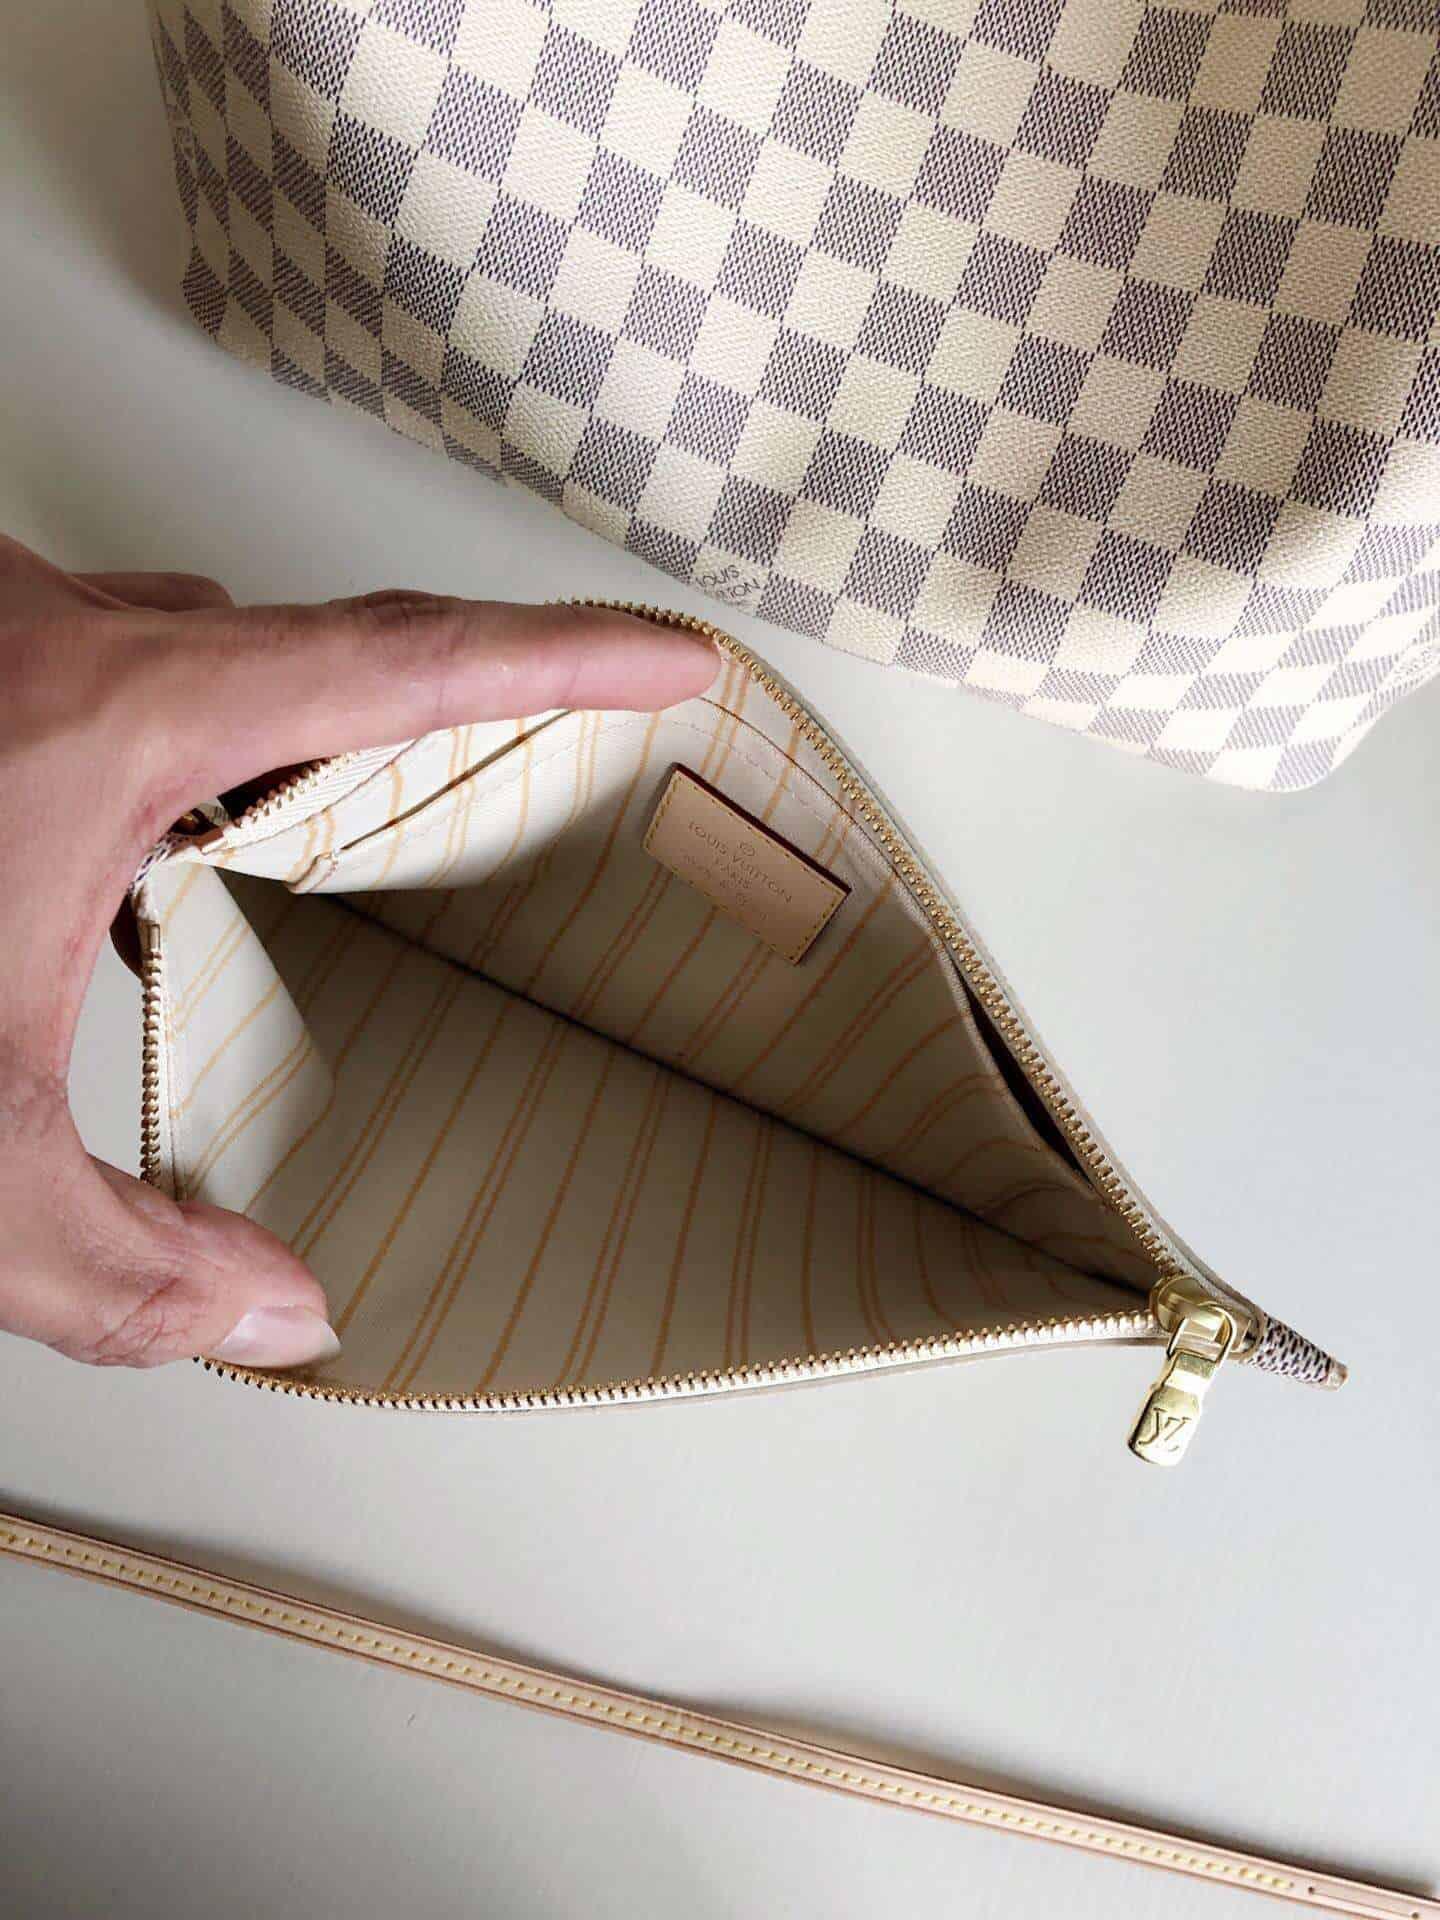 LV NEVERFULL 中号手袋棋盘白格购物袋 N41361 米白色内里